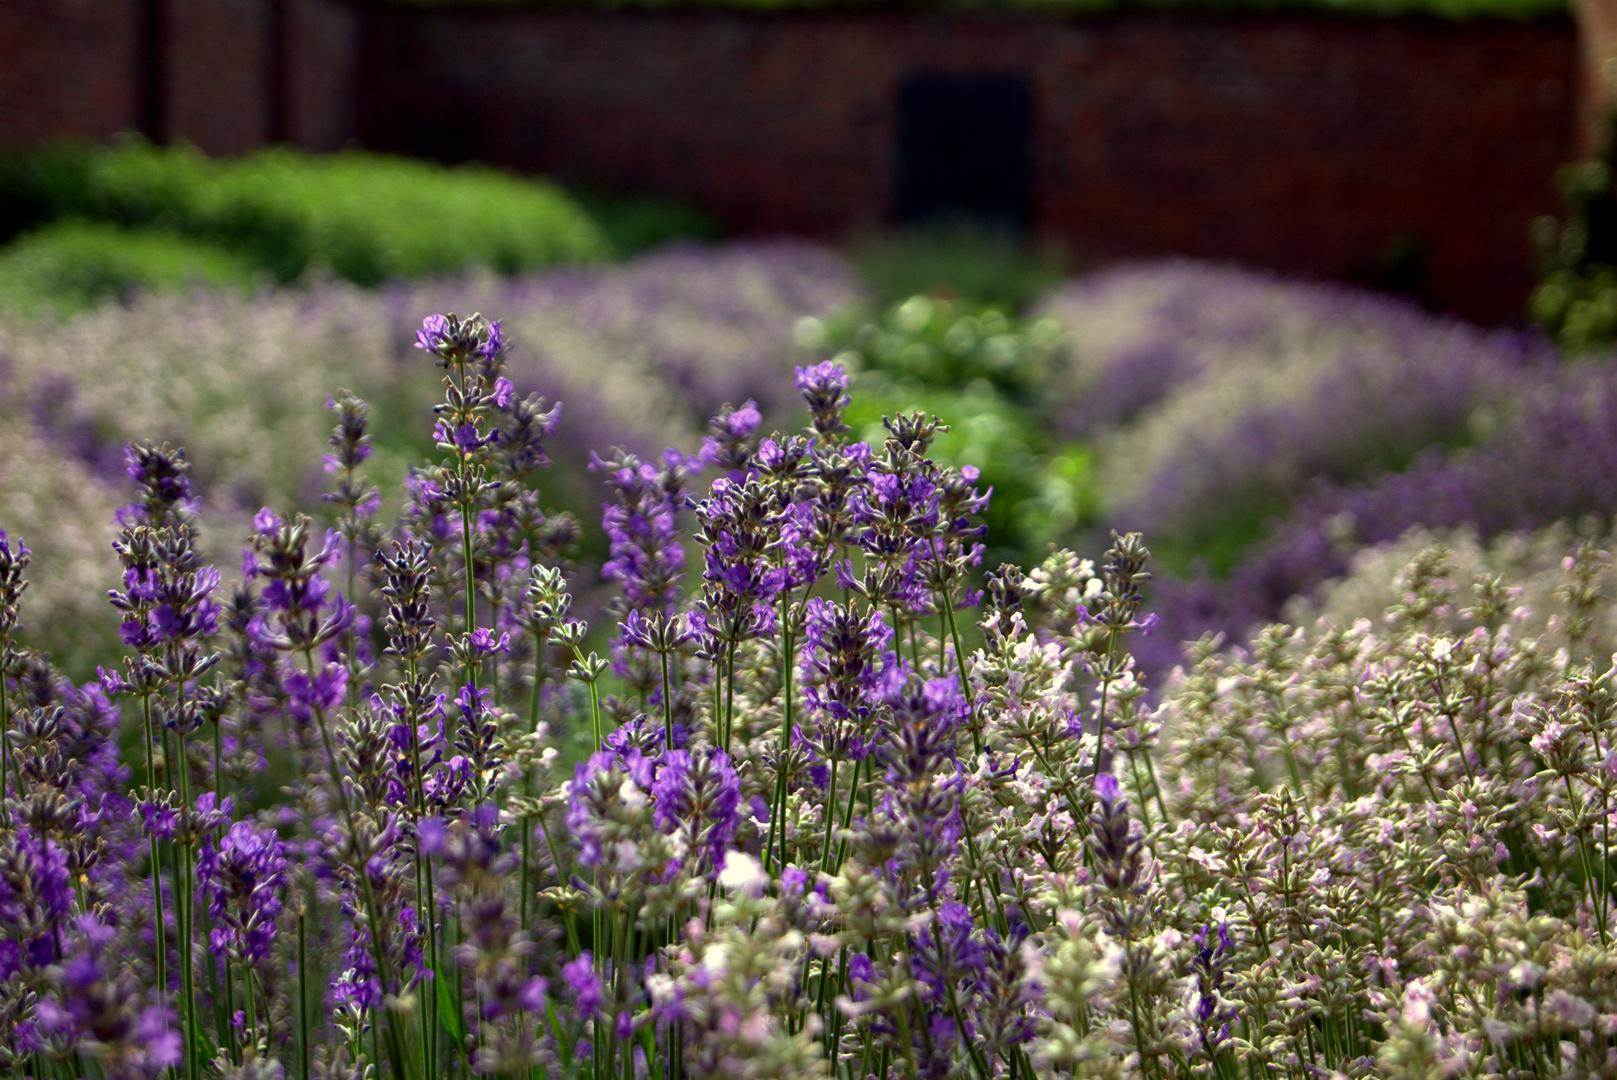 lavendelgarten foto bild pflanzen pilze flechten bl ten kleinpflanzen lavendel. Black Bedroom Furniture Sets. Home Design Ideas